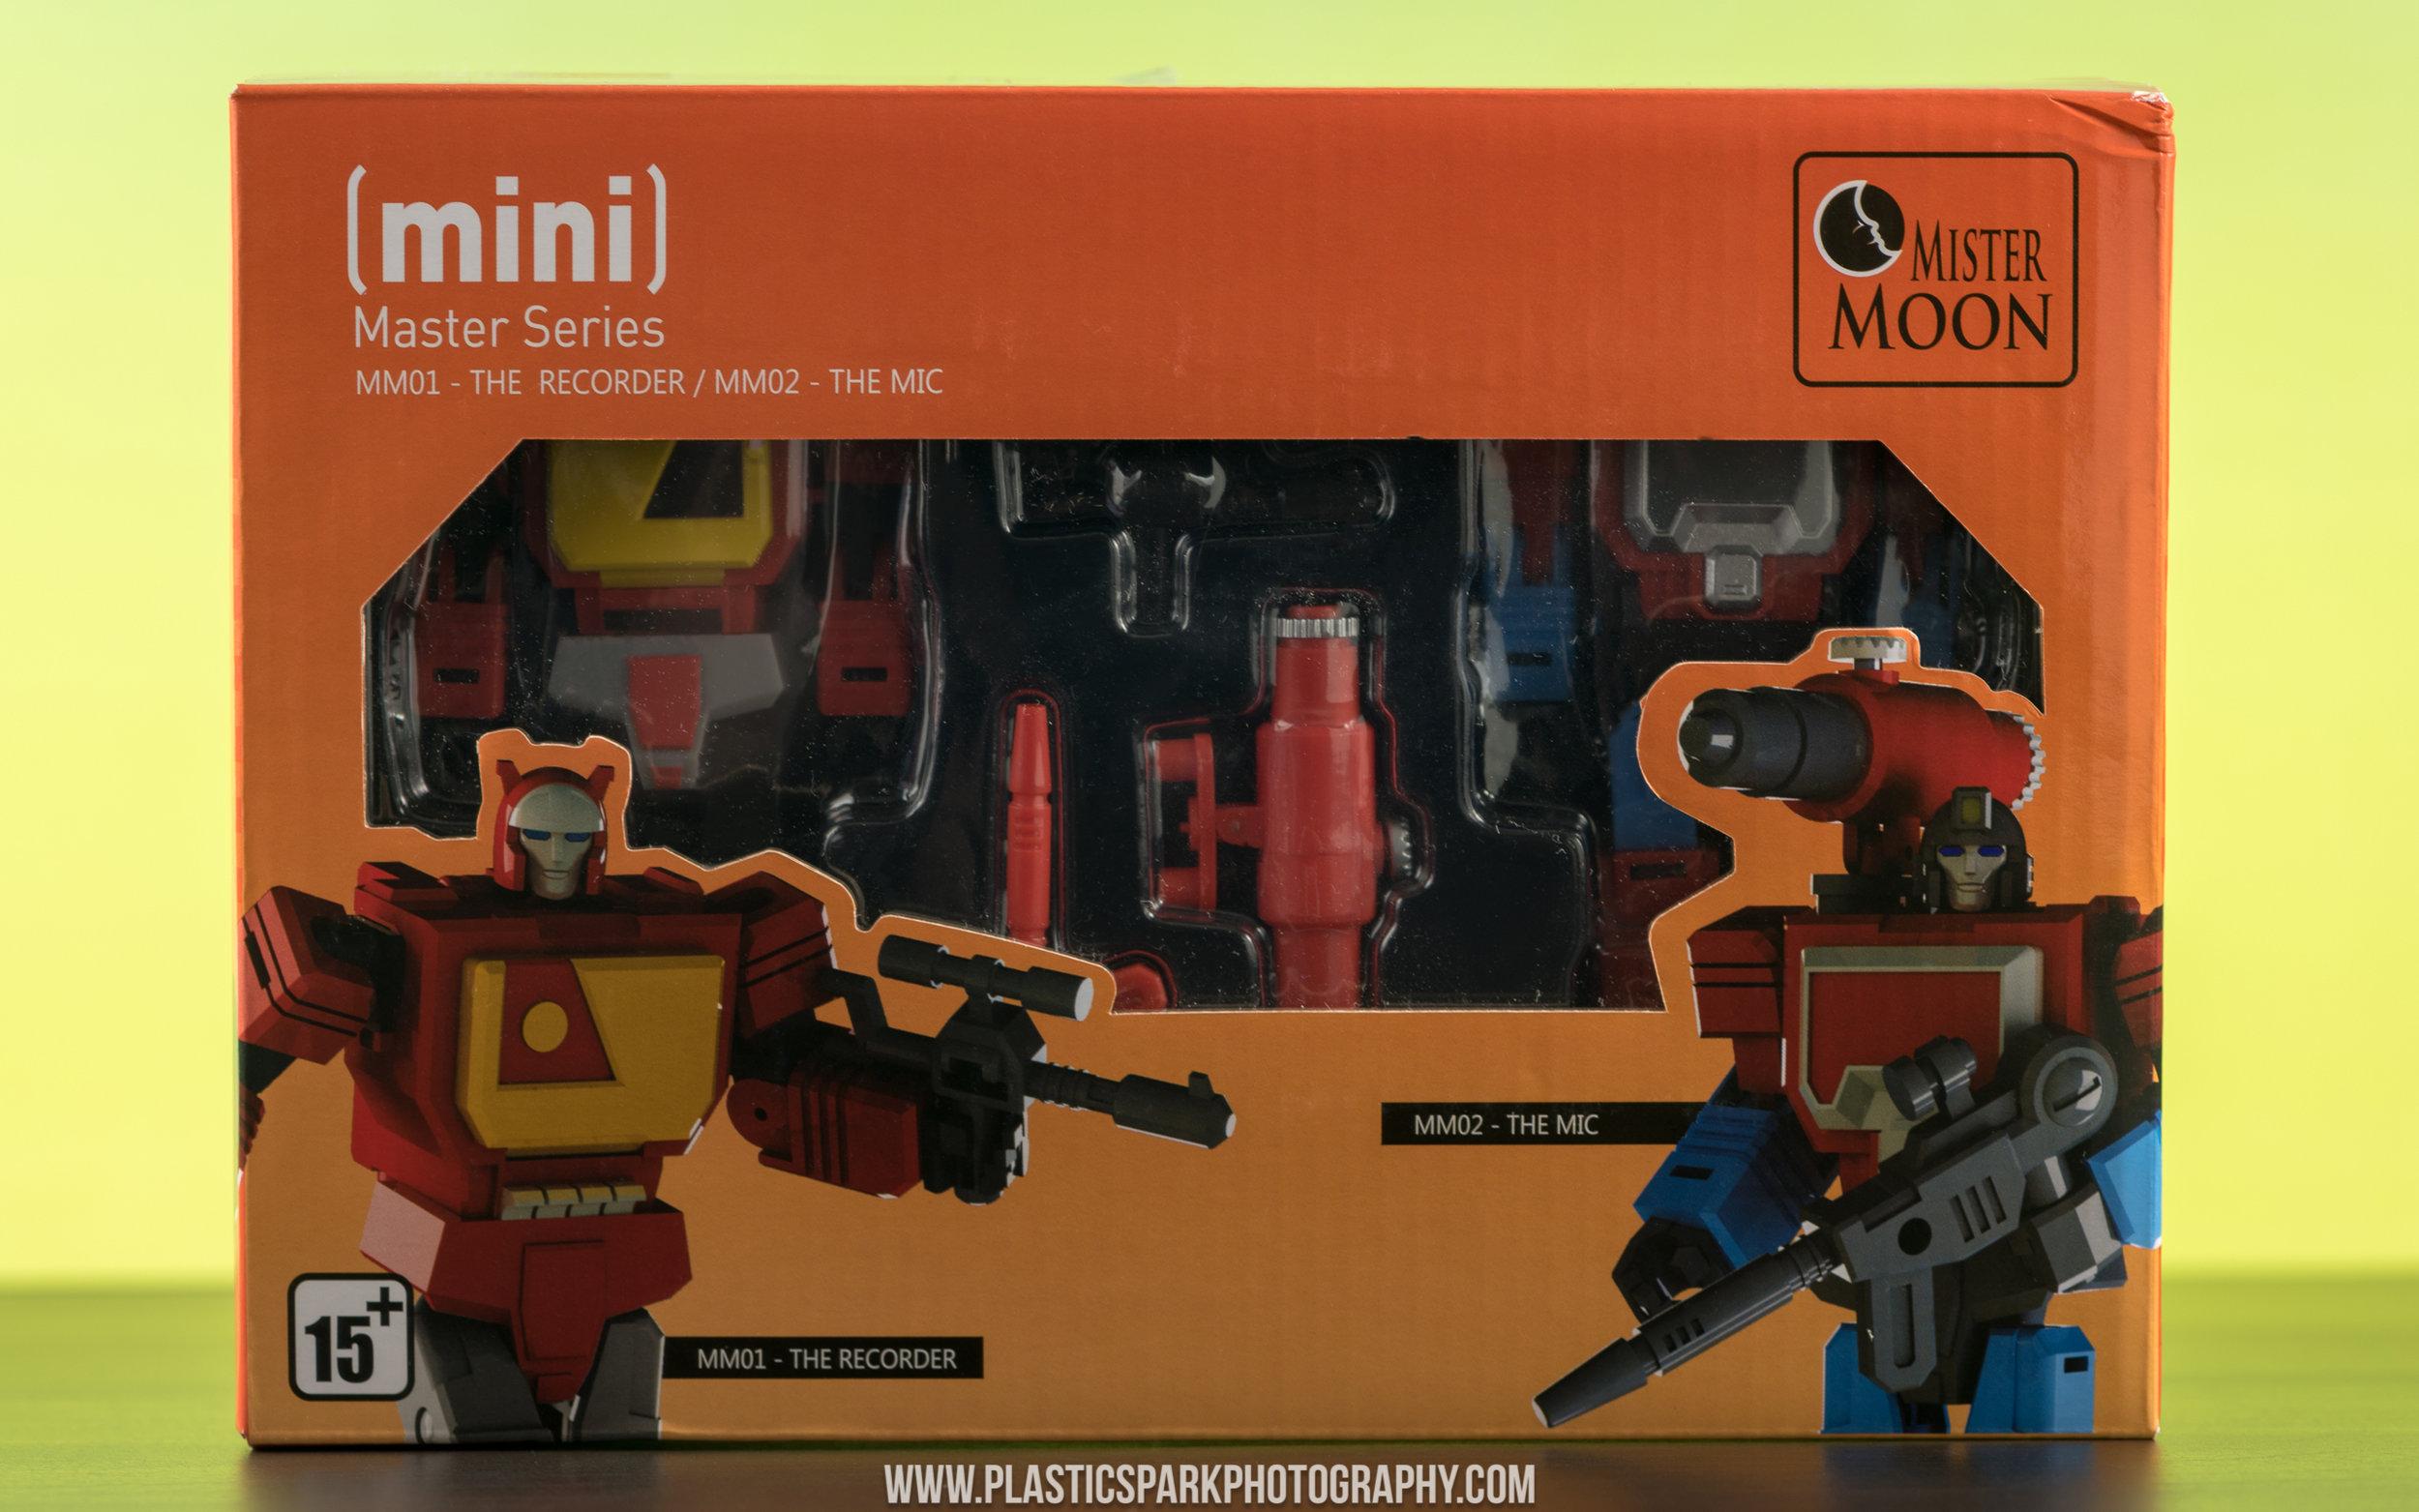 Mister Moon Mini Series MM01 + MM02 (1 of 20).jpg